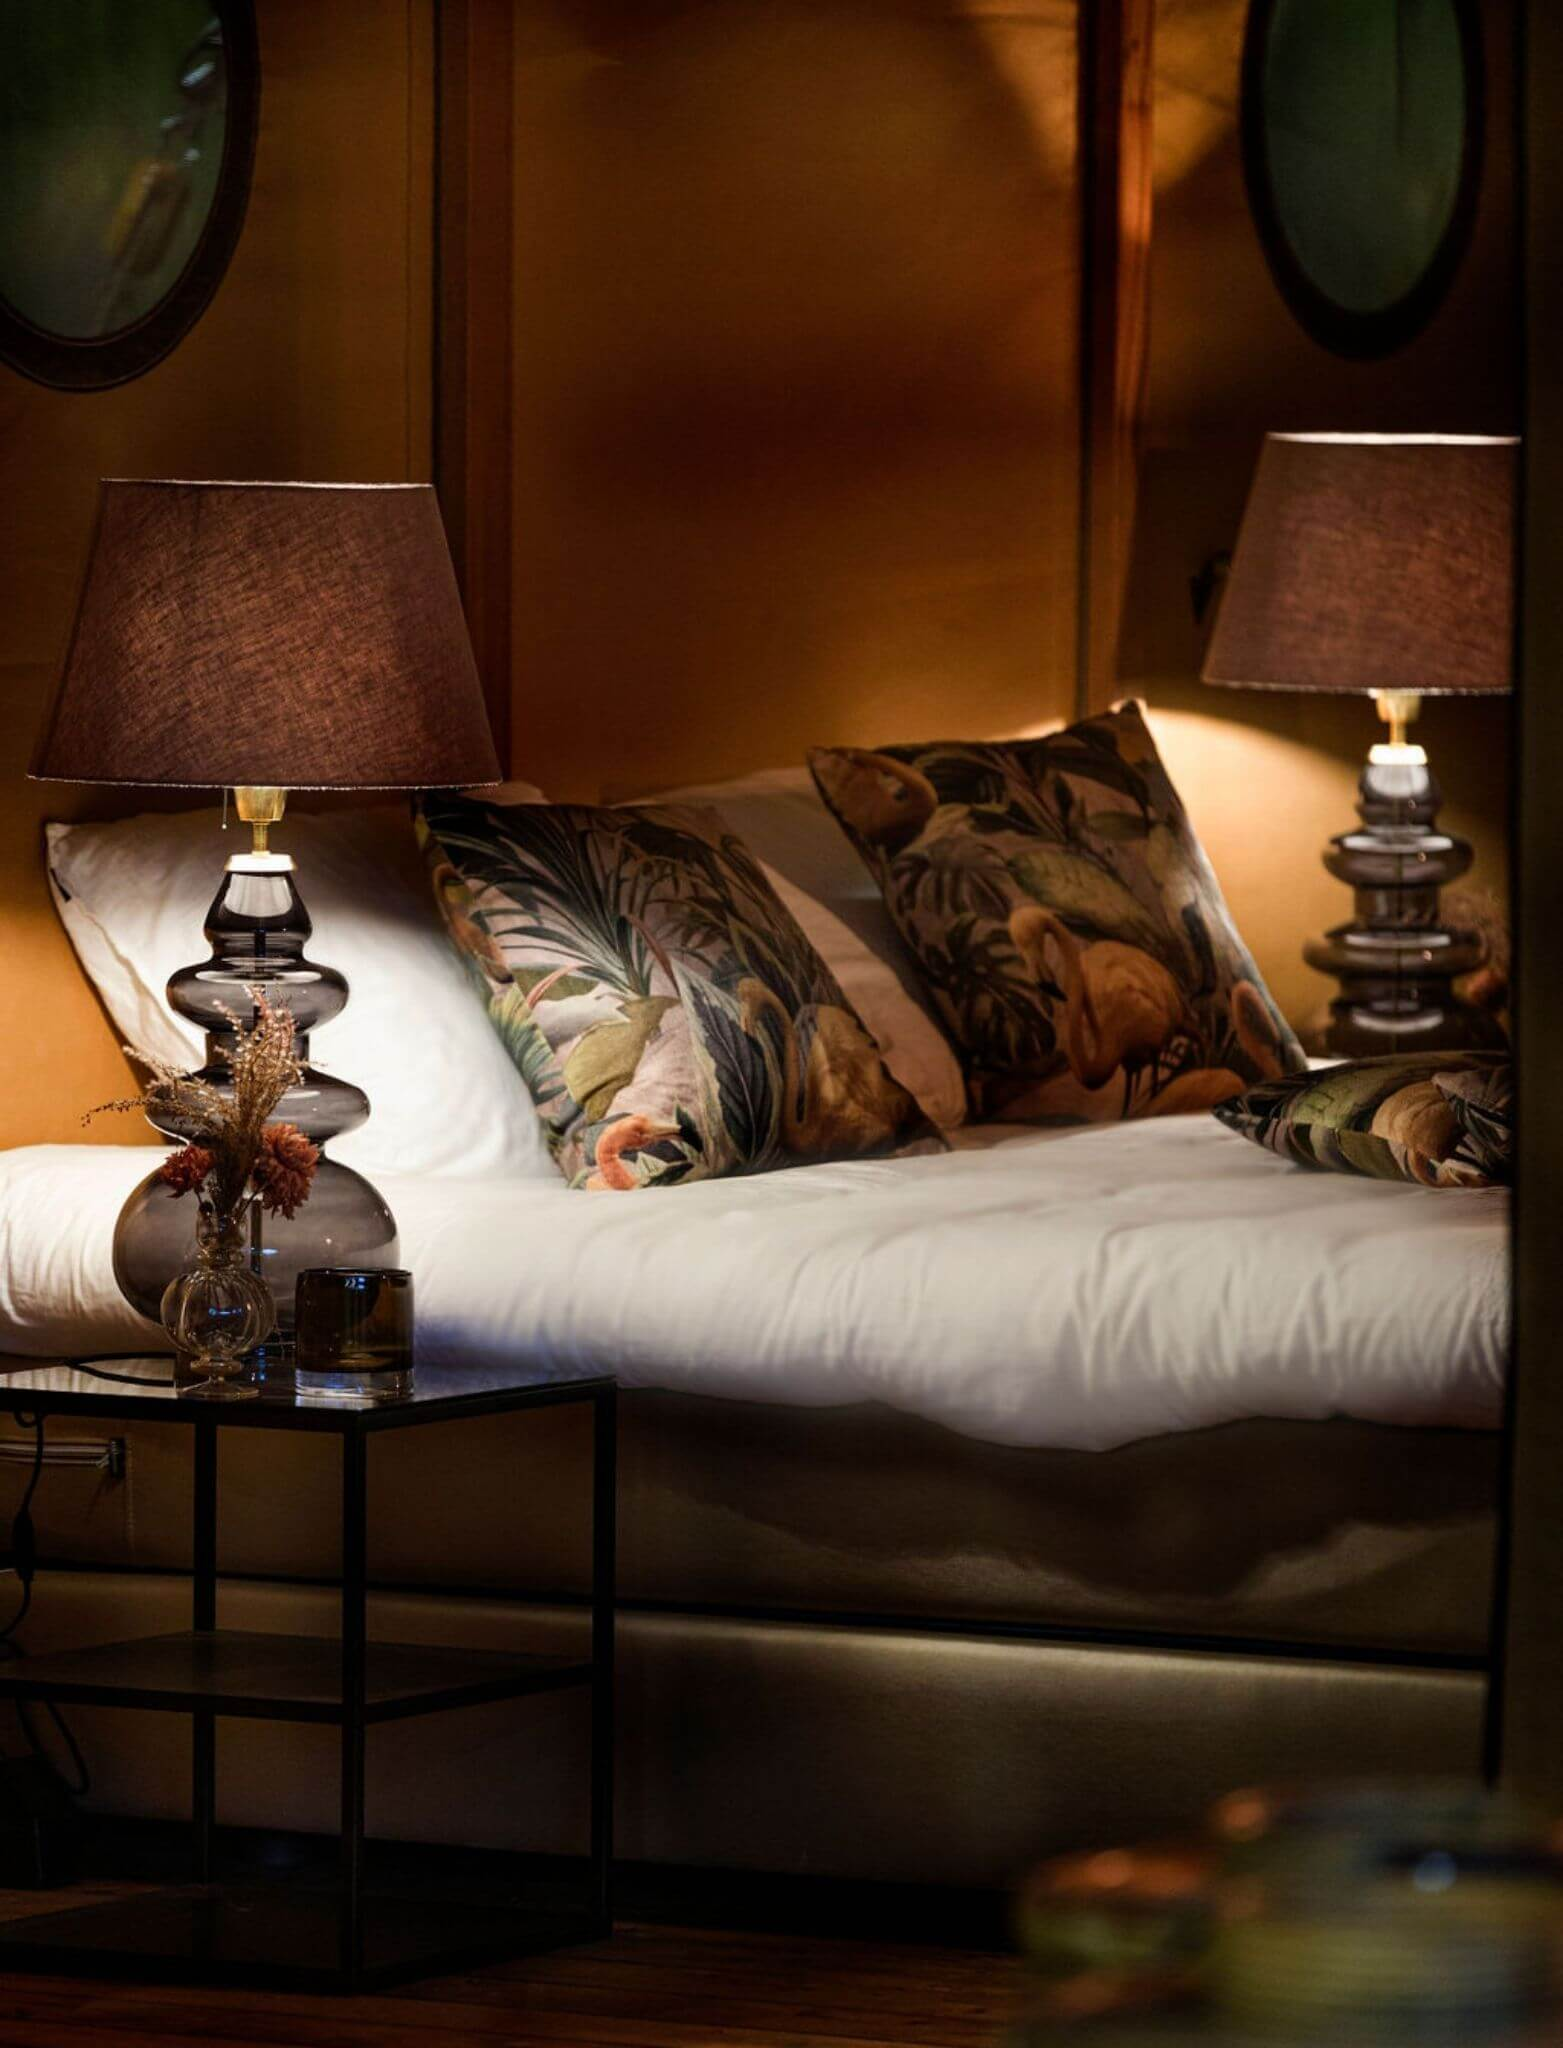 YALA_bedroom_detail_by_night_interior_Pristine